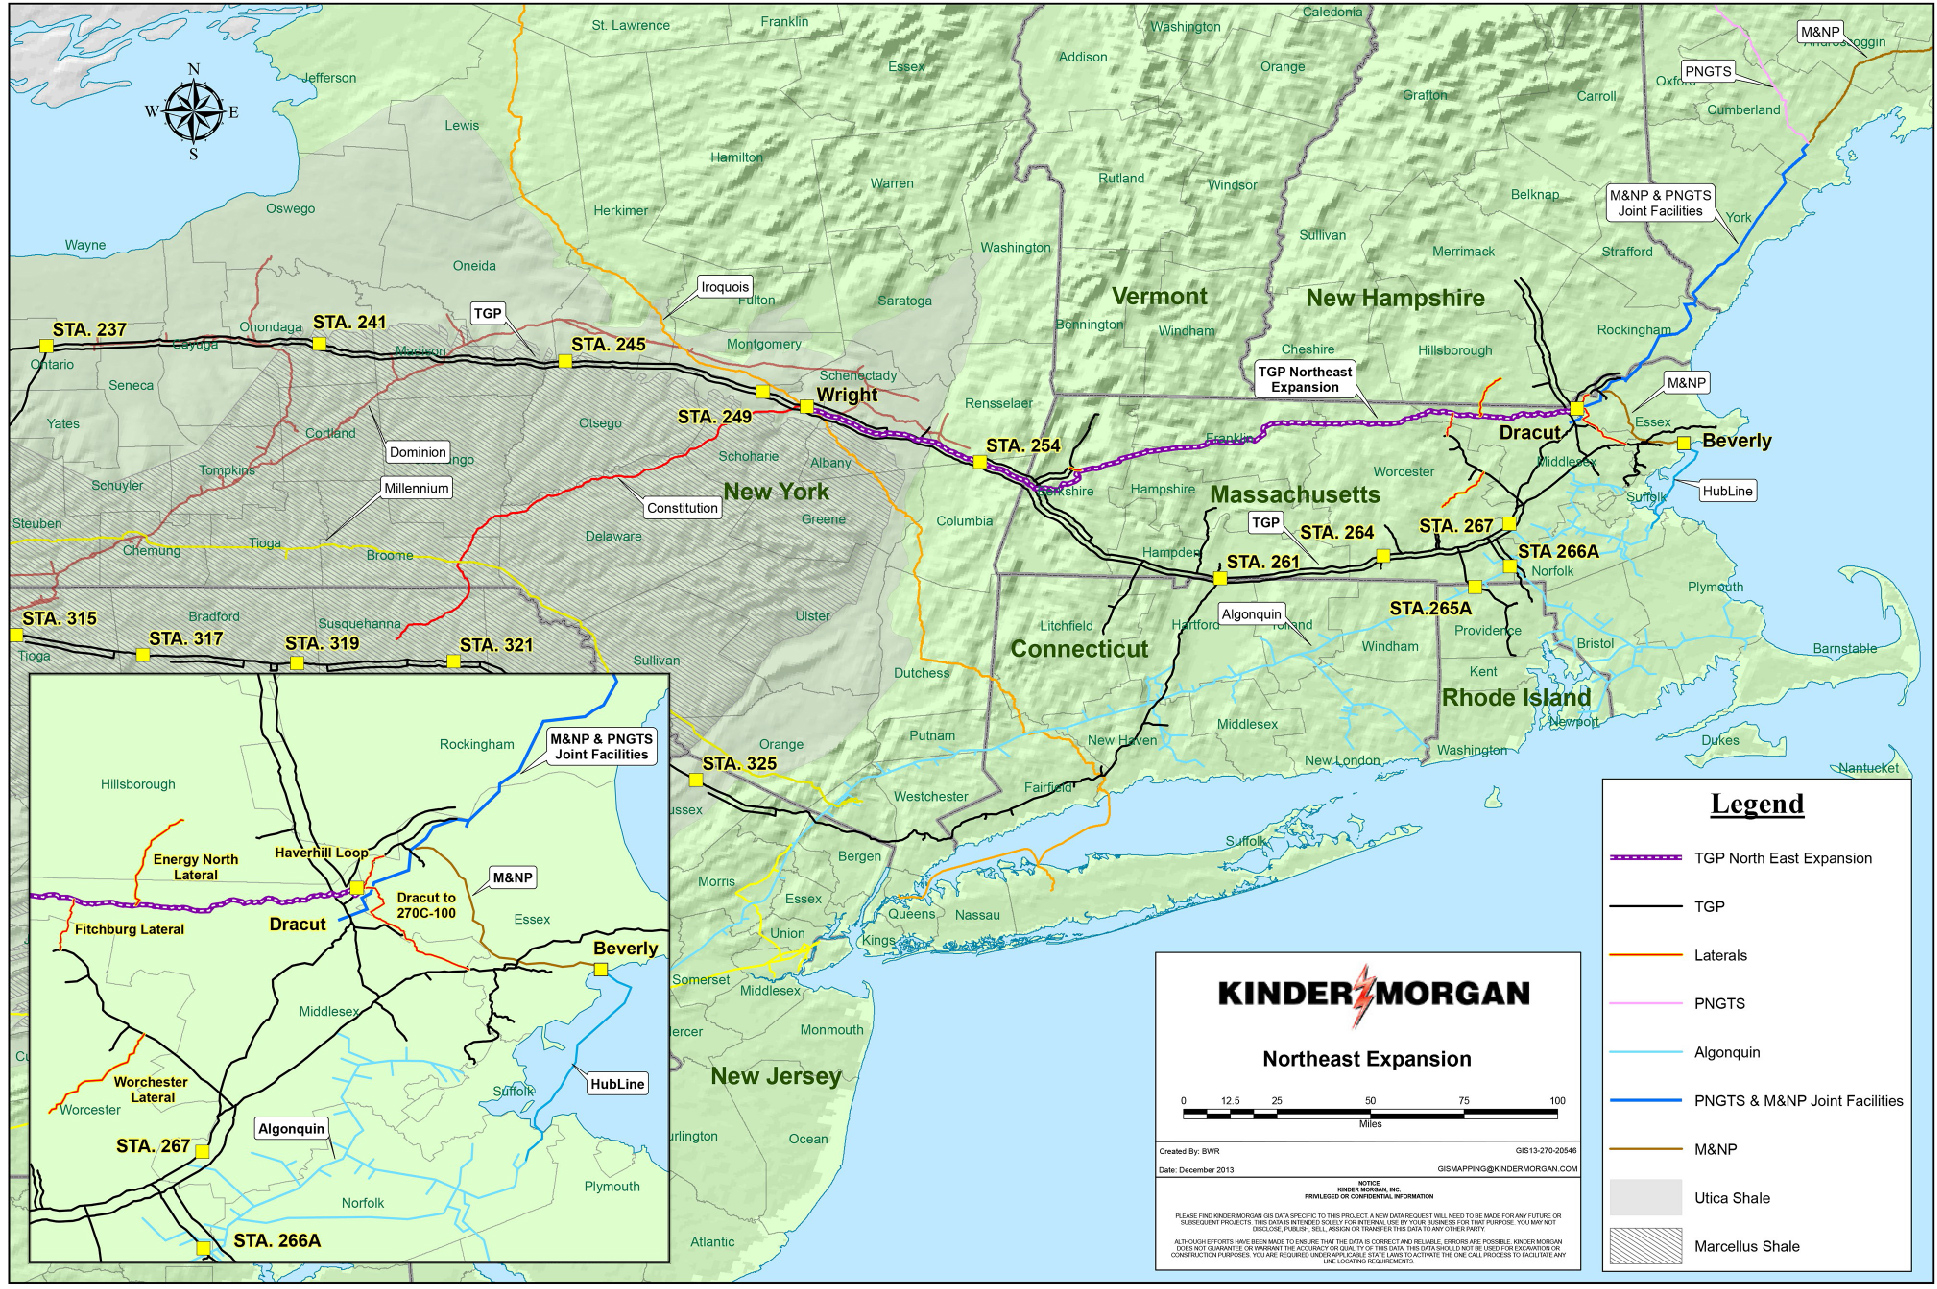 Kinder Morgan paid Massachusetts State Police $115 thousand